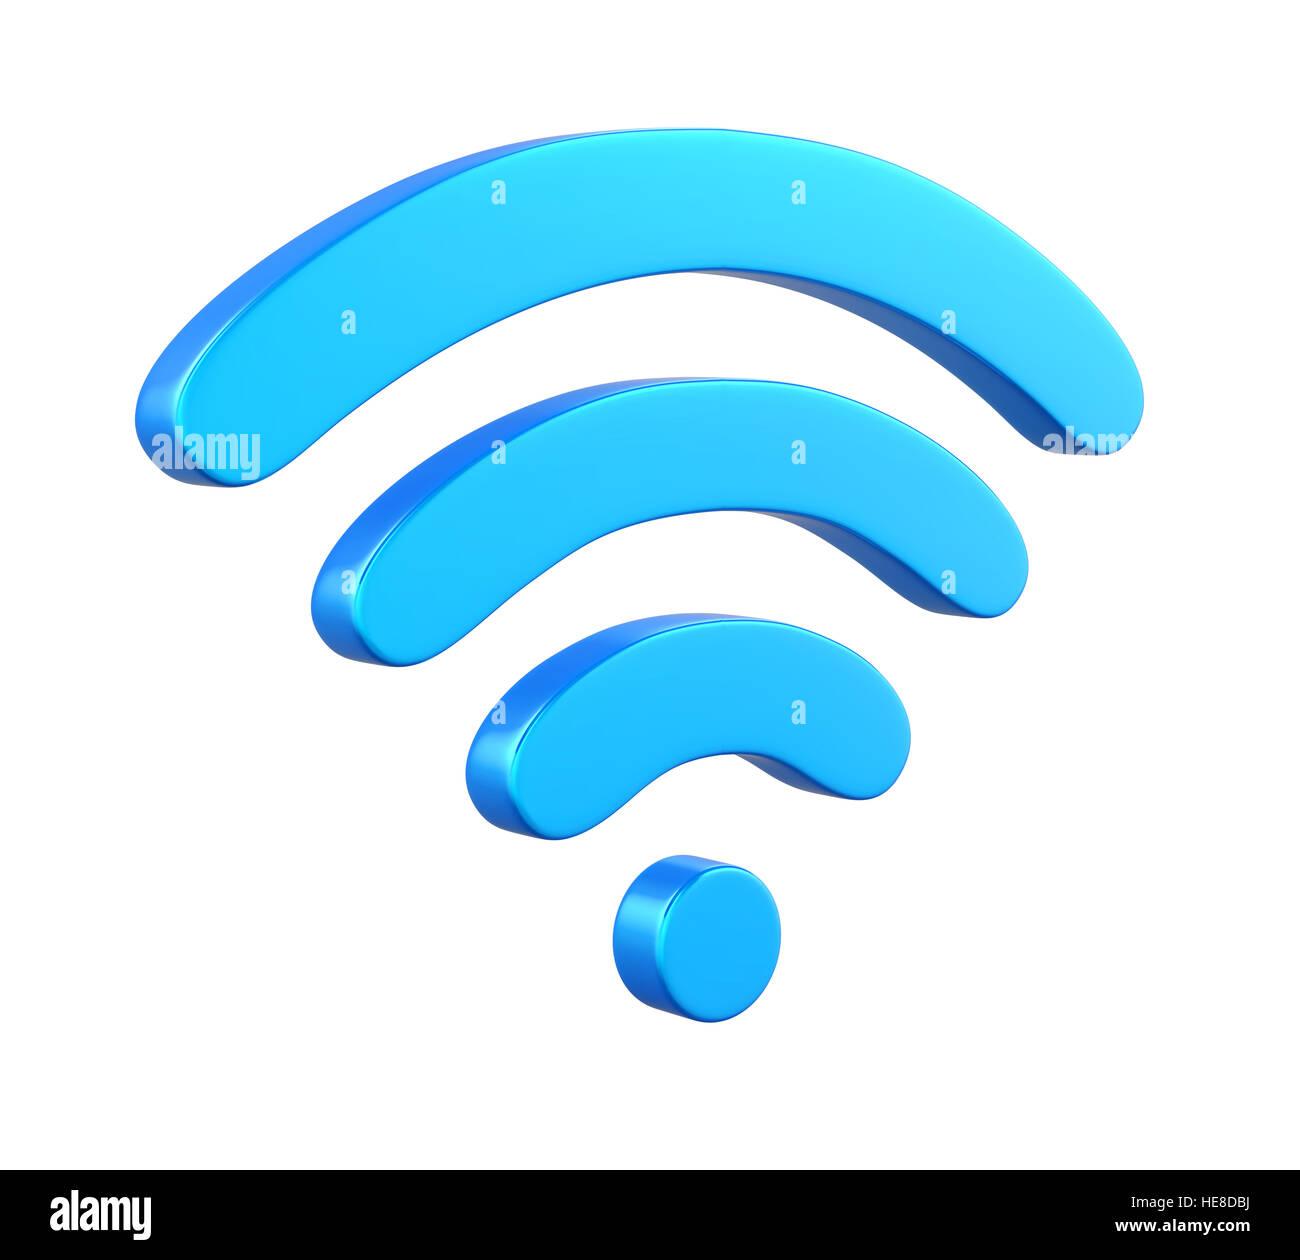 Wireless Network Symbol - Stock Image